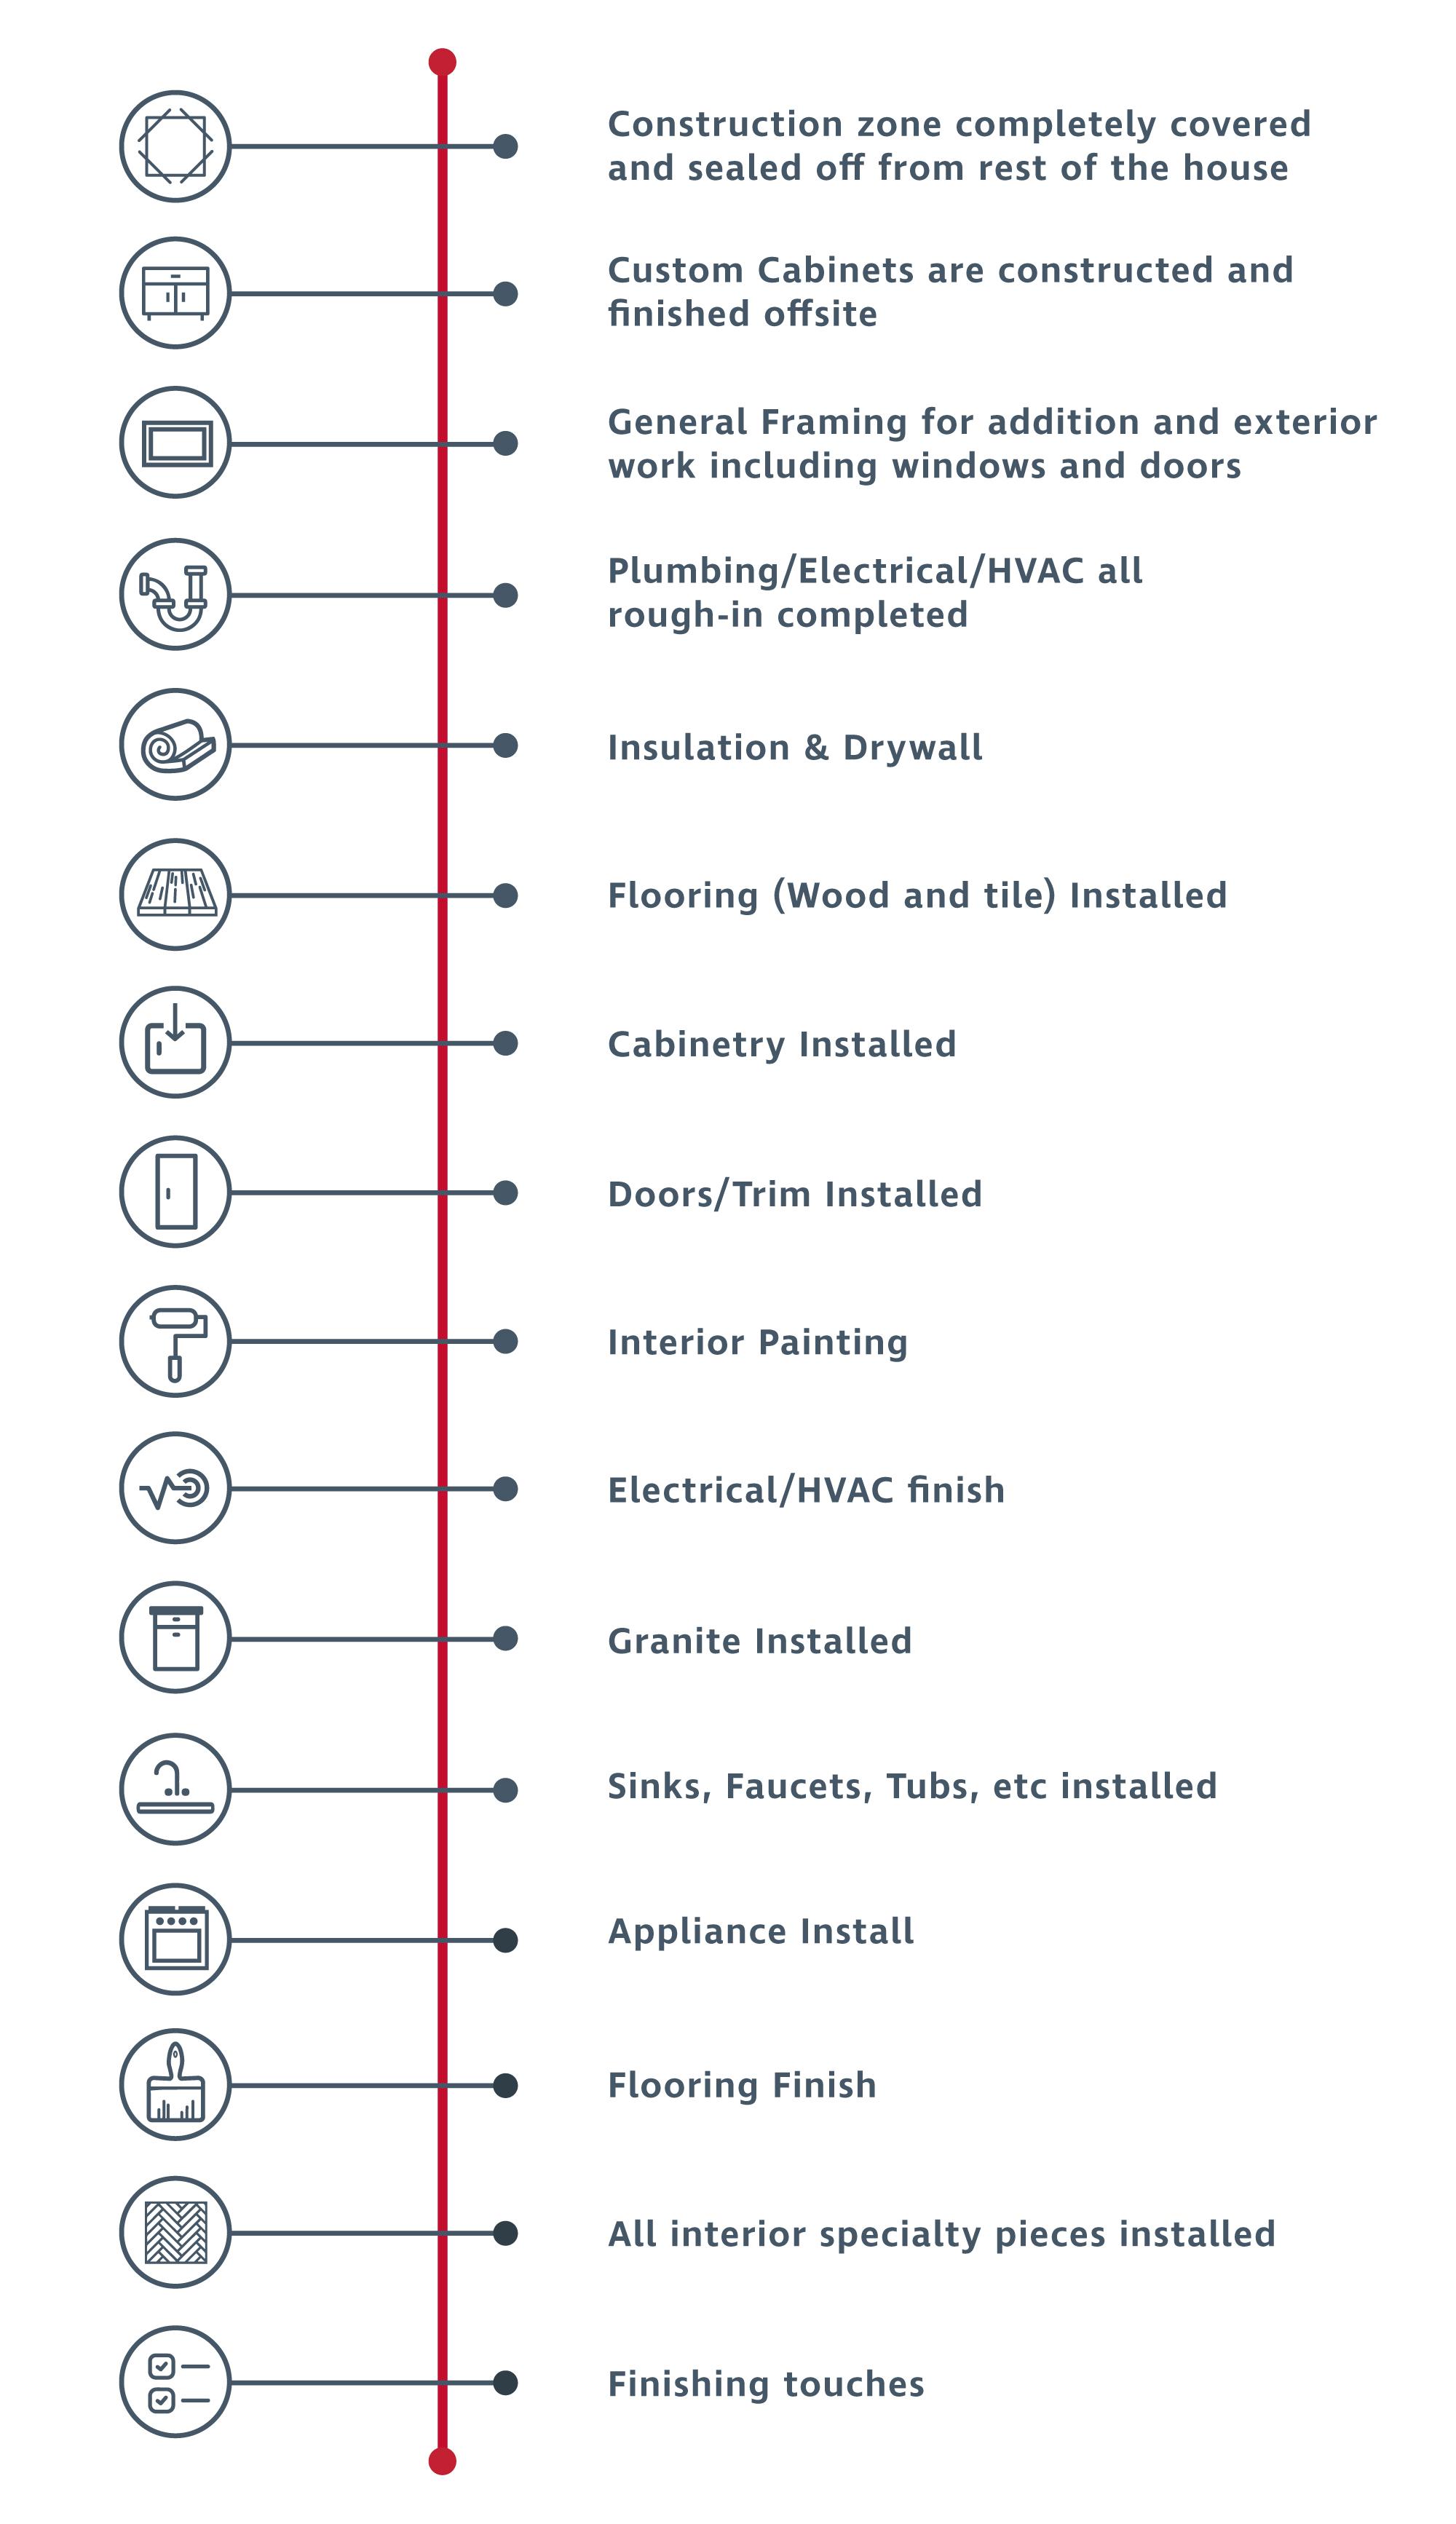 timeline-and-process-list.jpg